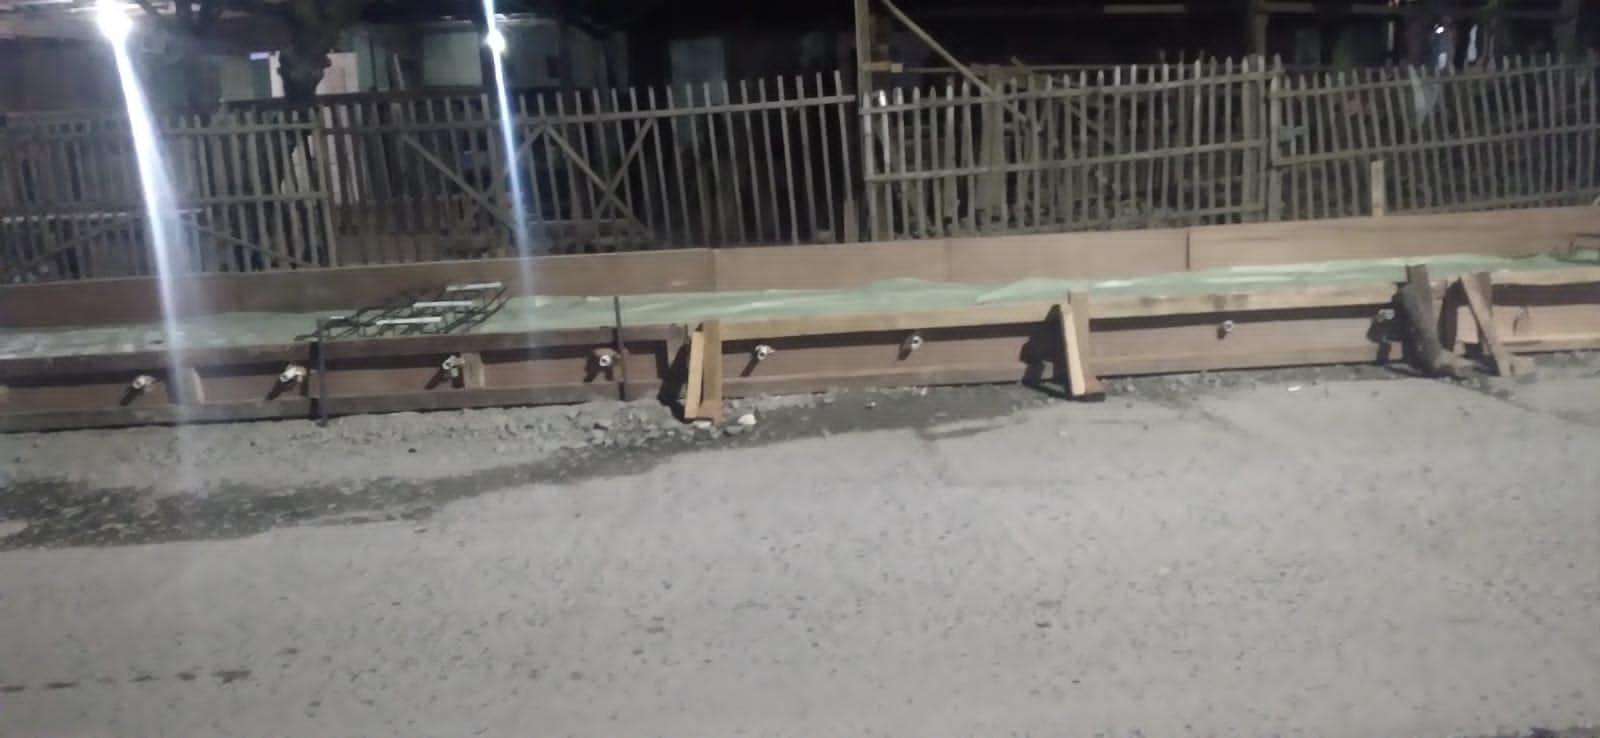 Lokasi pembangunan Jalan raya Bosih yang tak sesuai standar. Ist/Suara Bekasi Online.